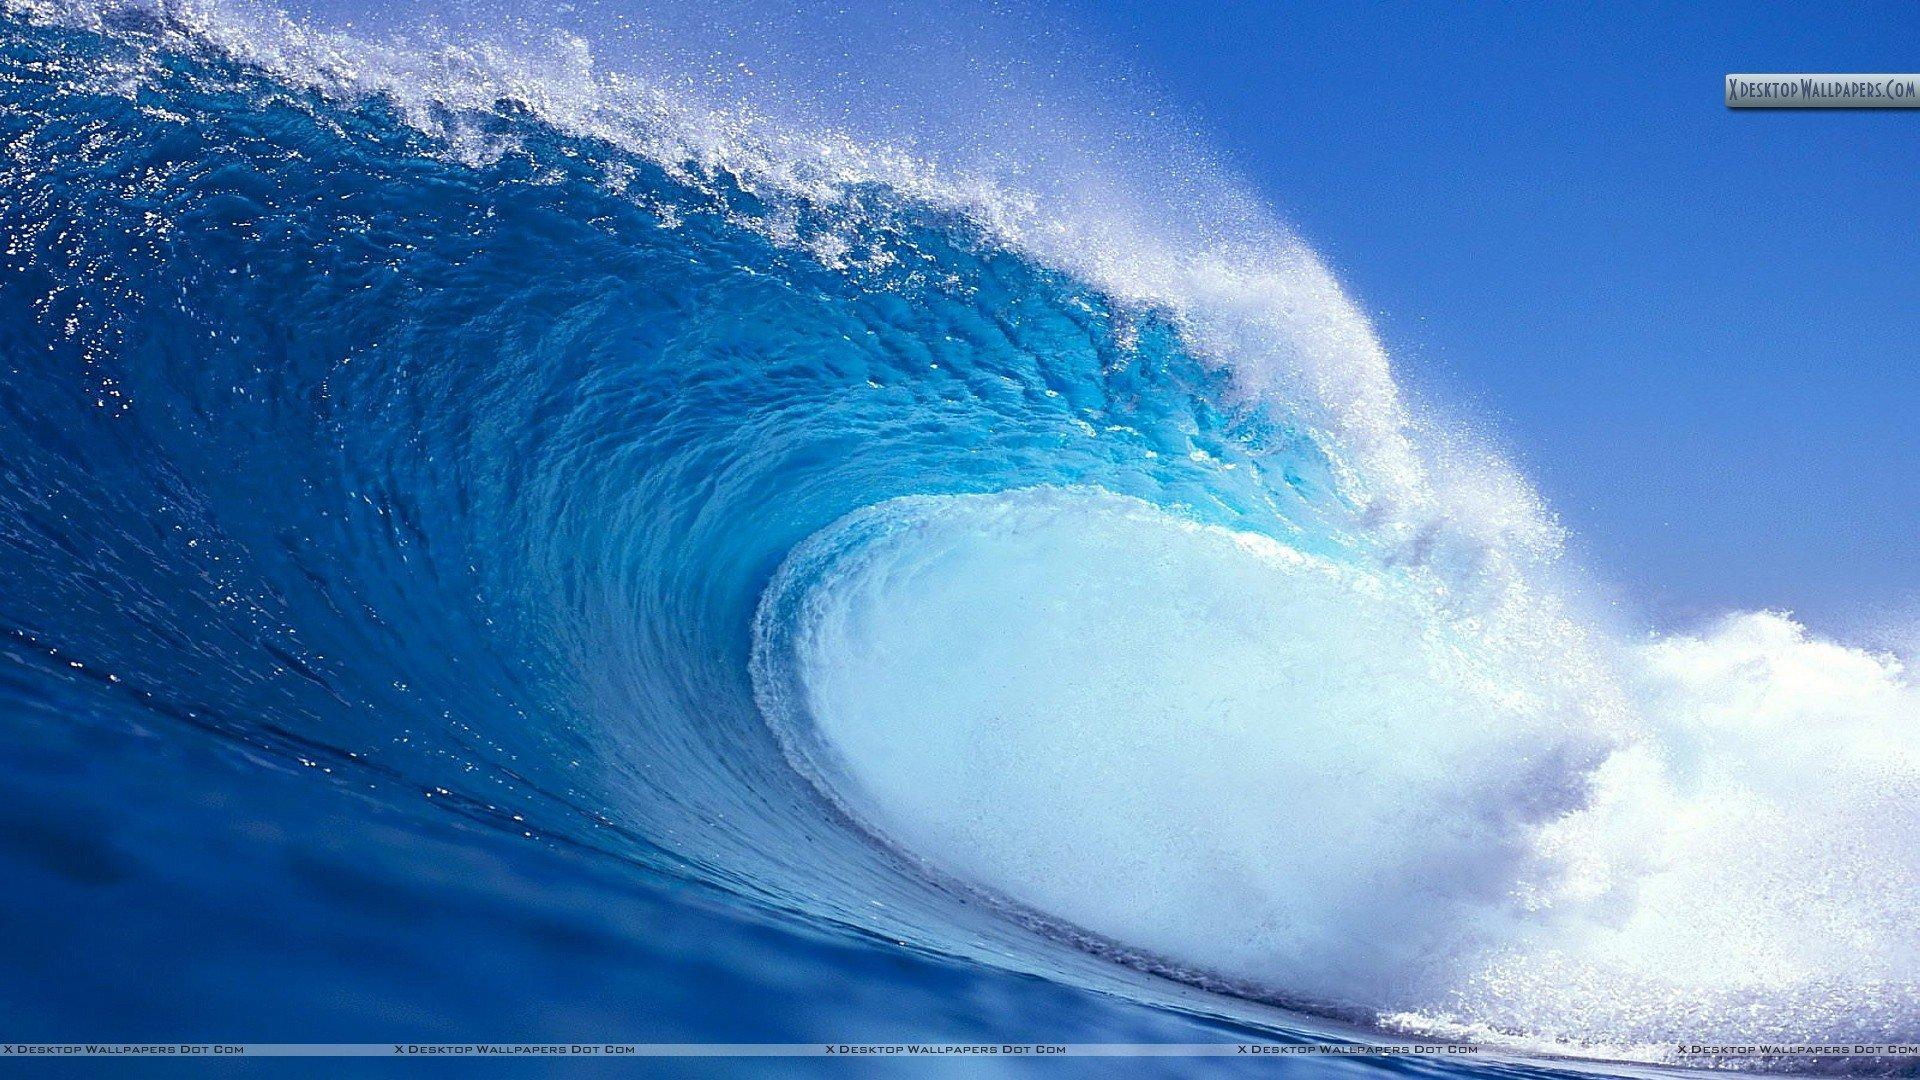 Blue Water Waves Wallpaper 1920x1080